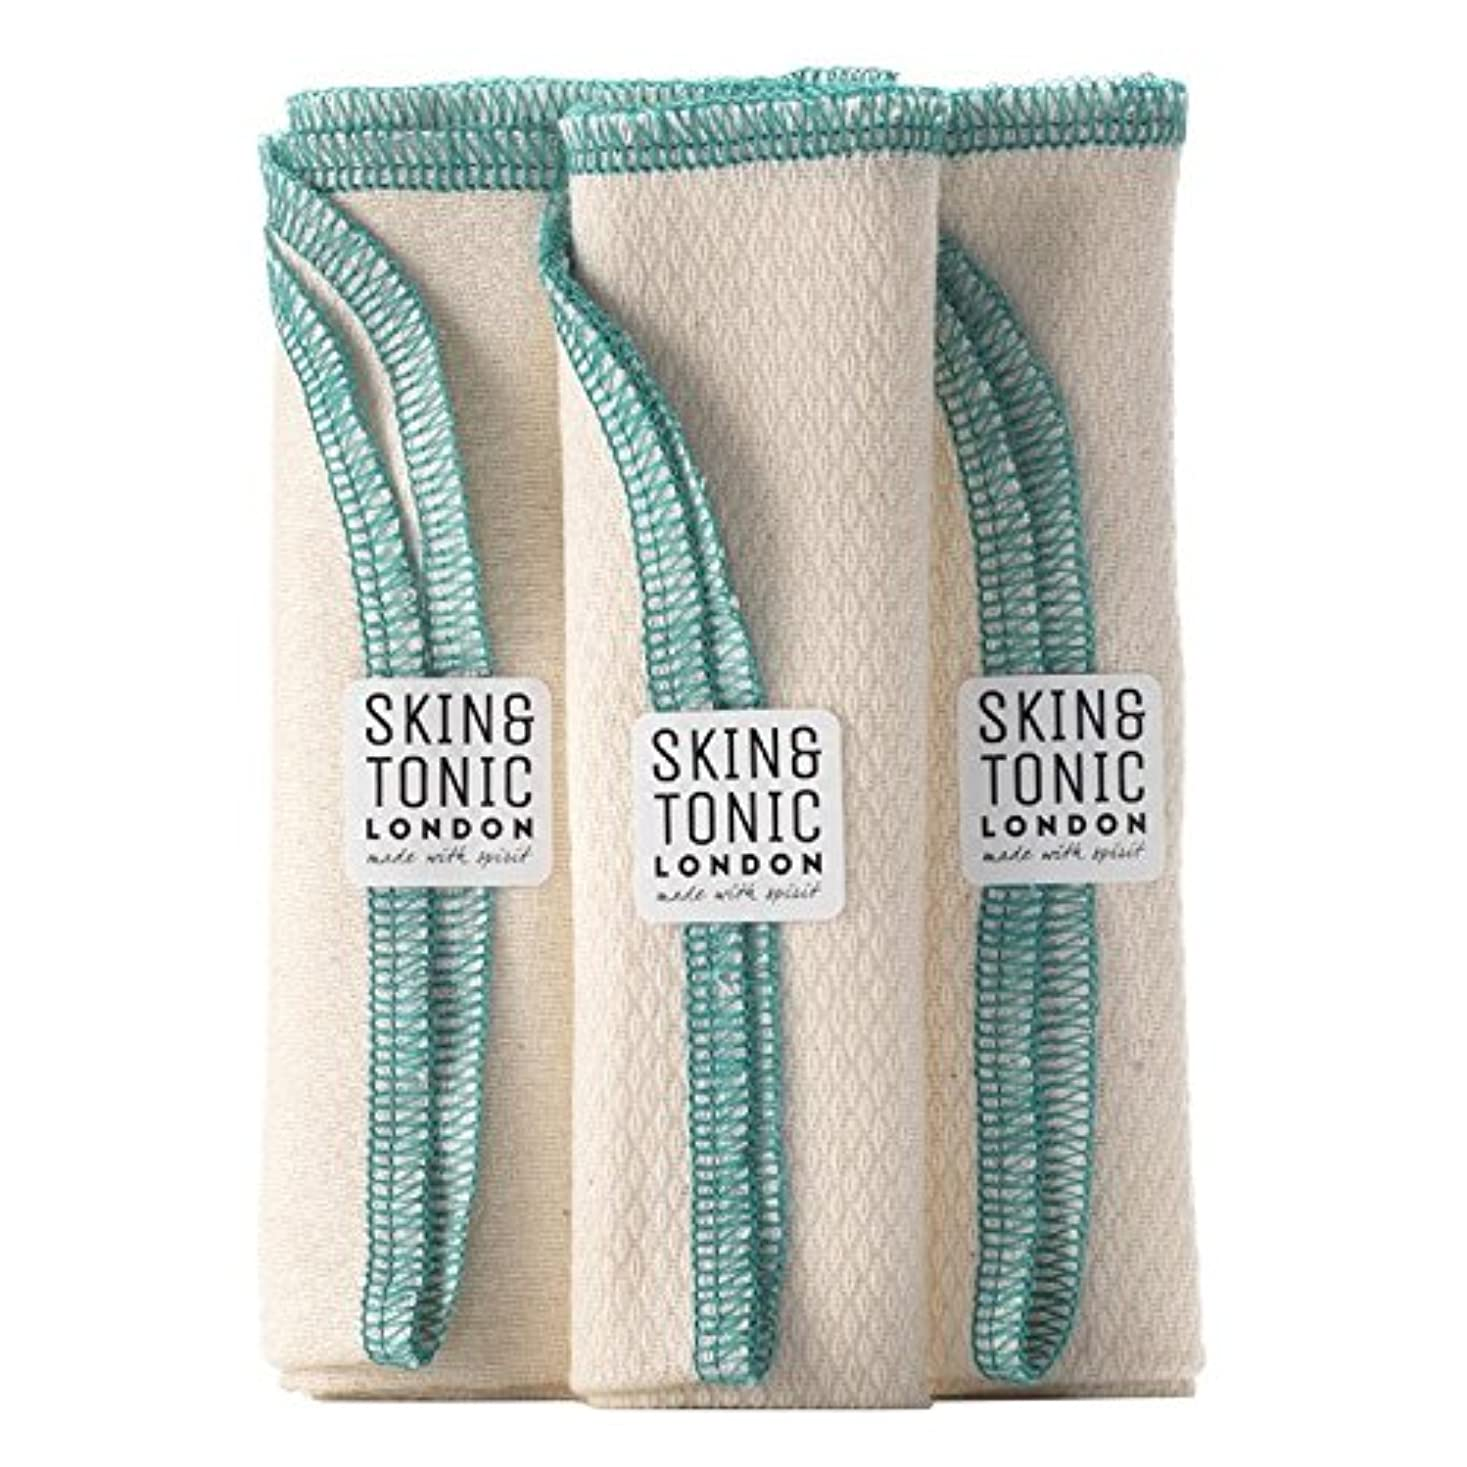 Skin & Tonic London Organic Cotton Cloth (Pack of 6) - スキン&トニックロンドンオーガニックコットン生地 x6 [並行輸入品]